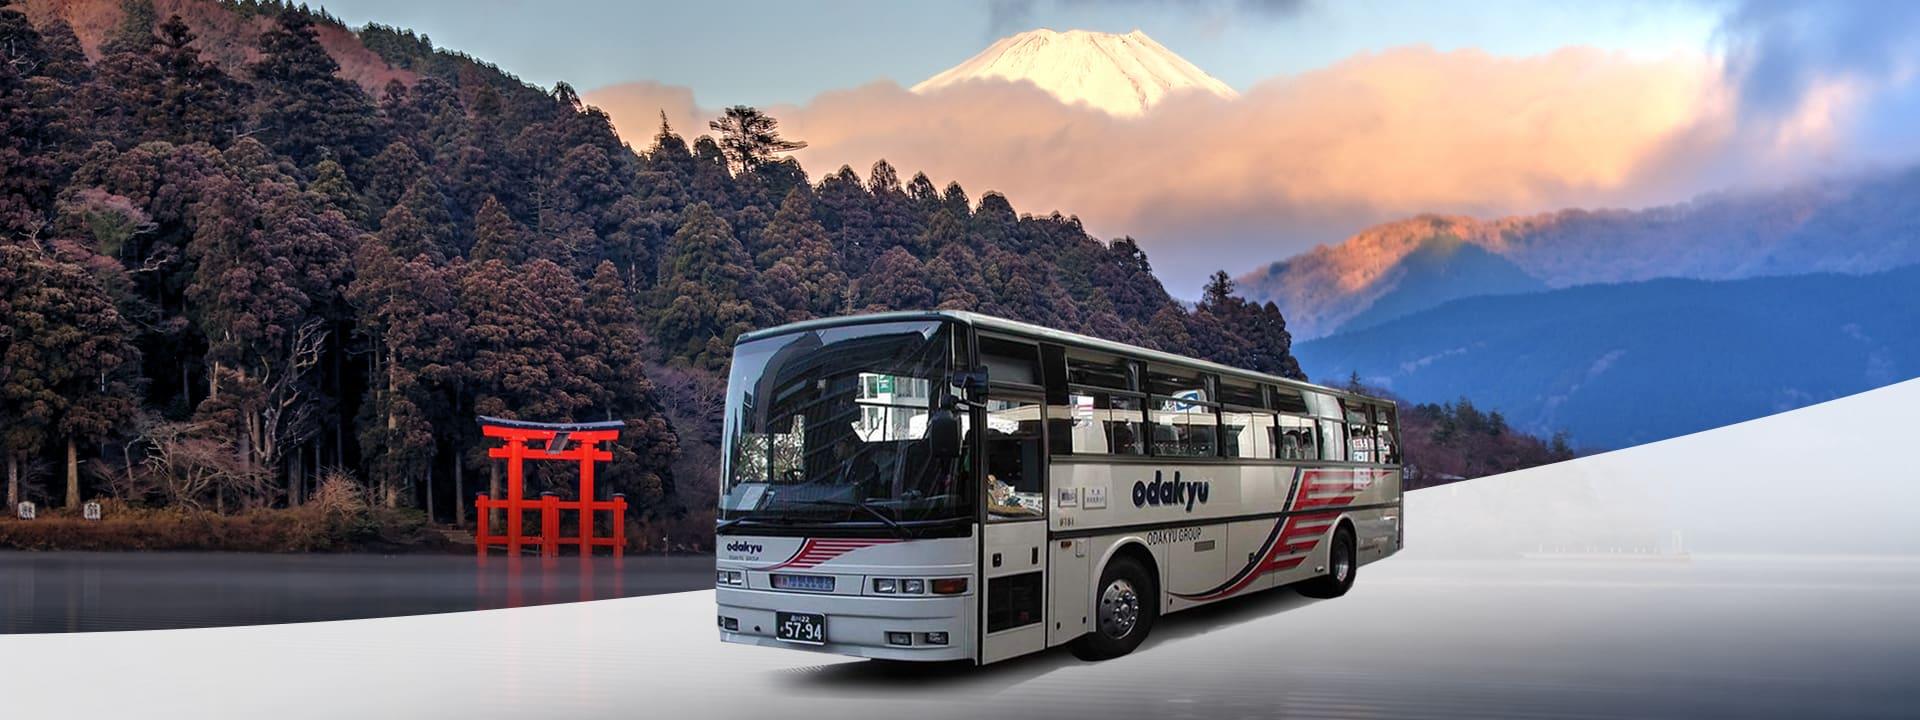 đi xe bus tại osaka với amazing pass